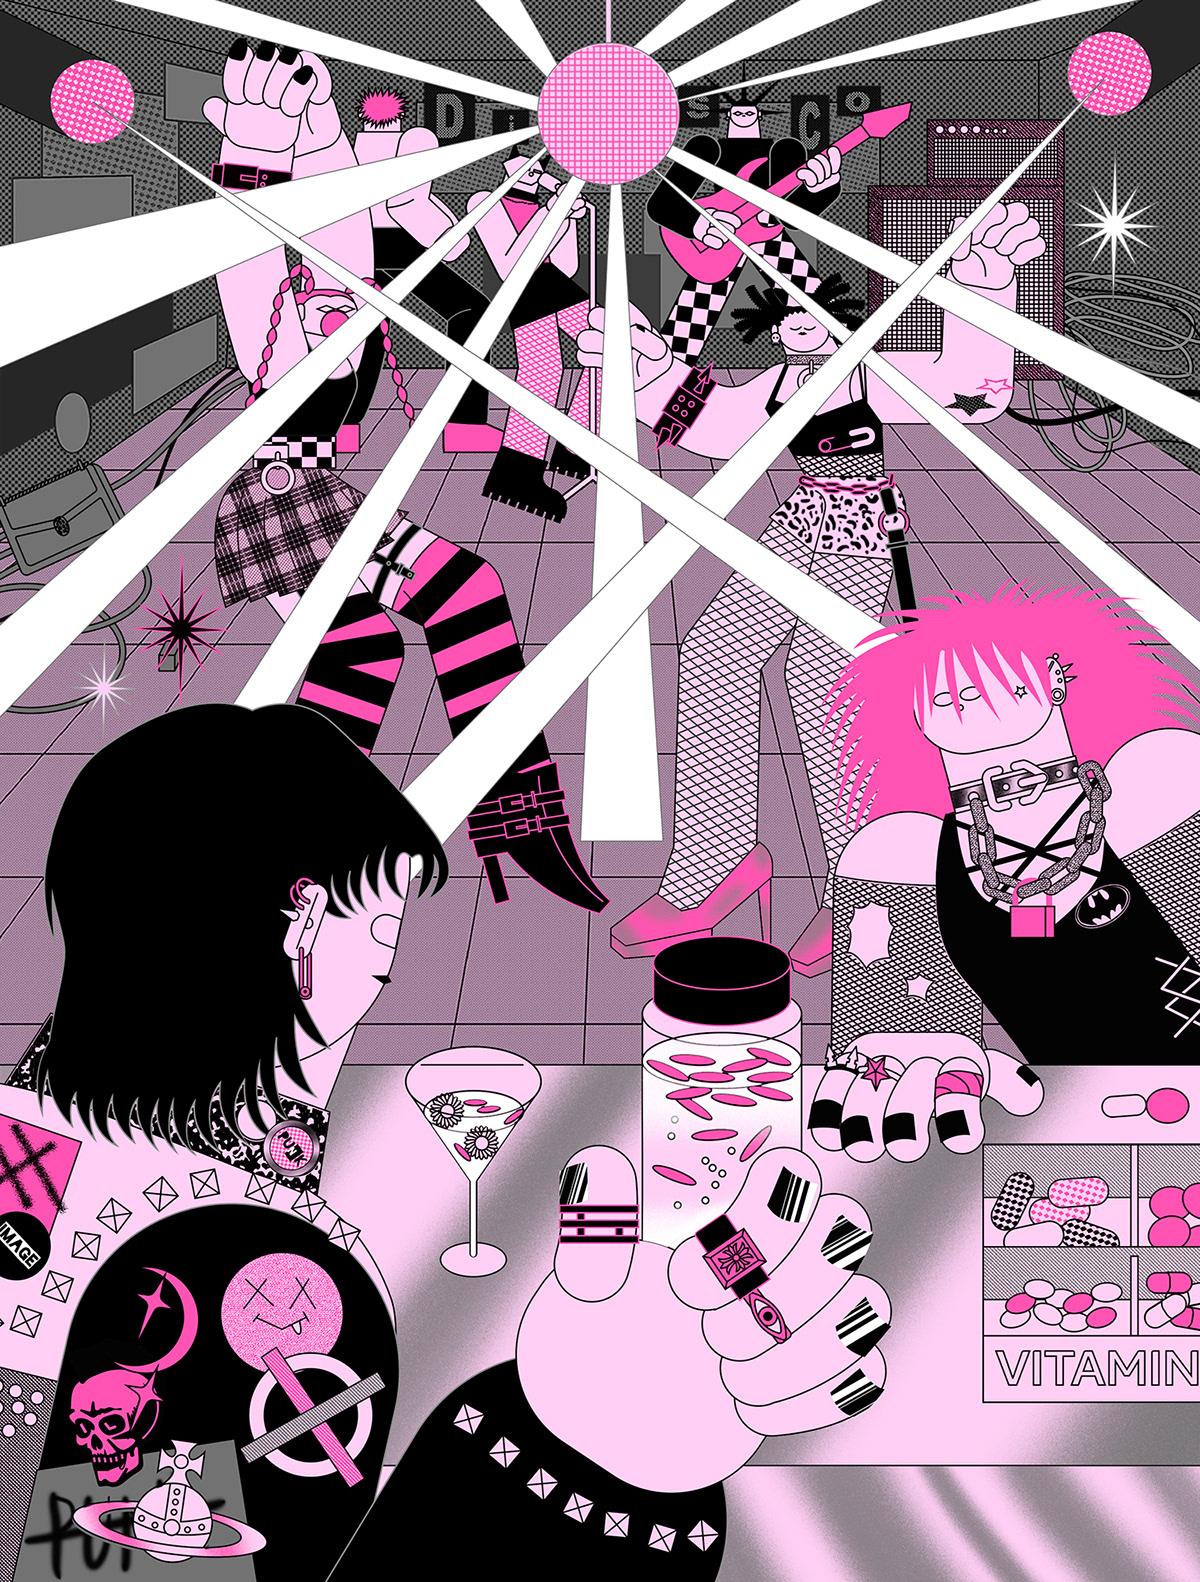 Image may contain: cartoon, art and poster